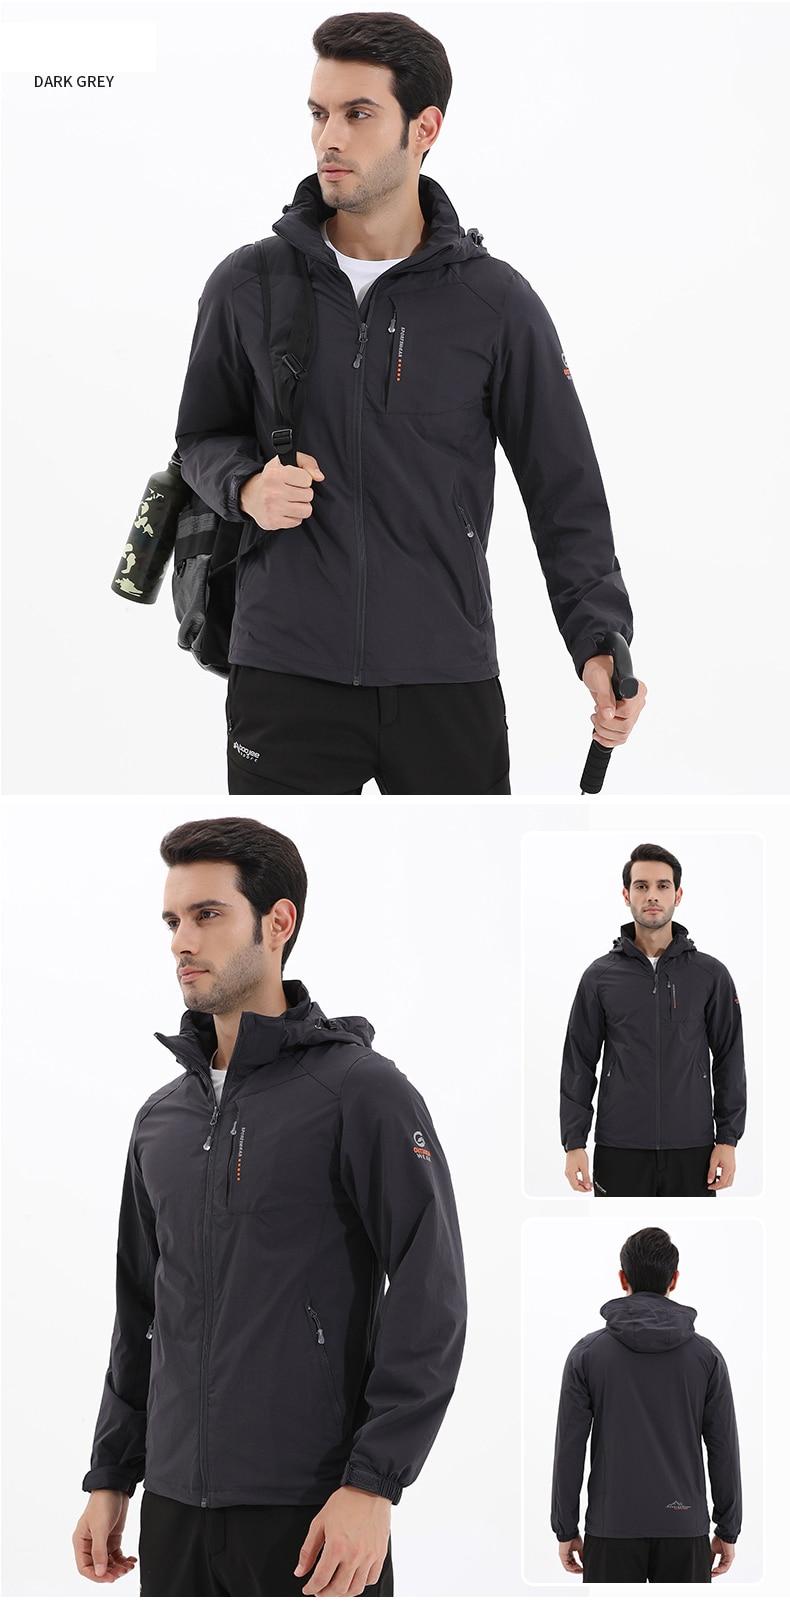 Mens-Softshell-Hiking-Jackets-(13)